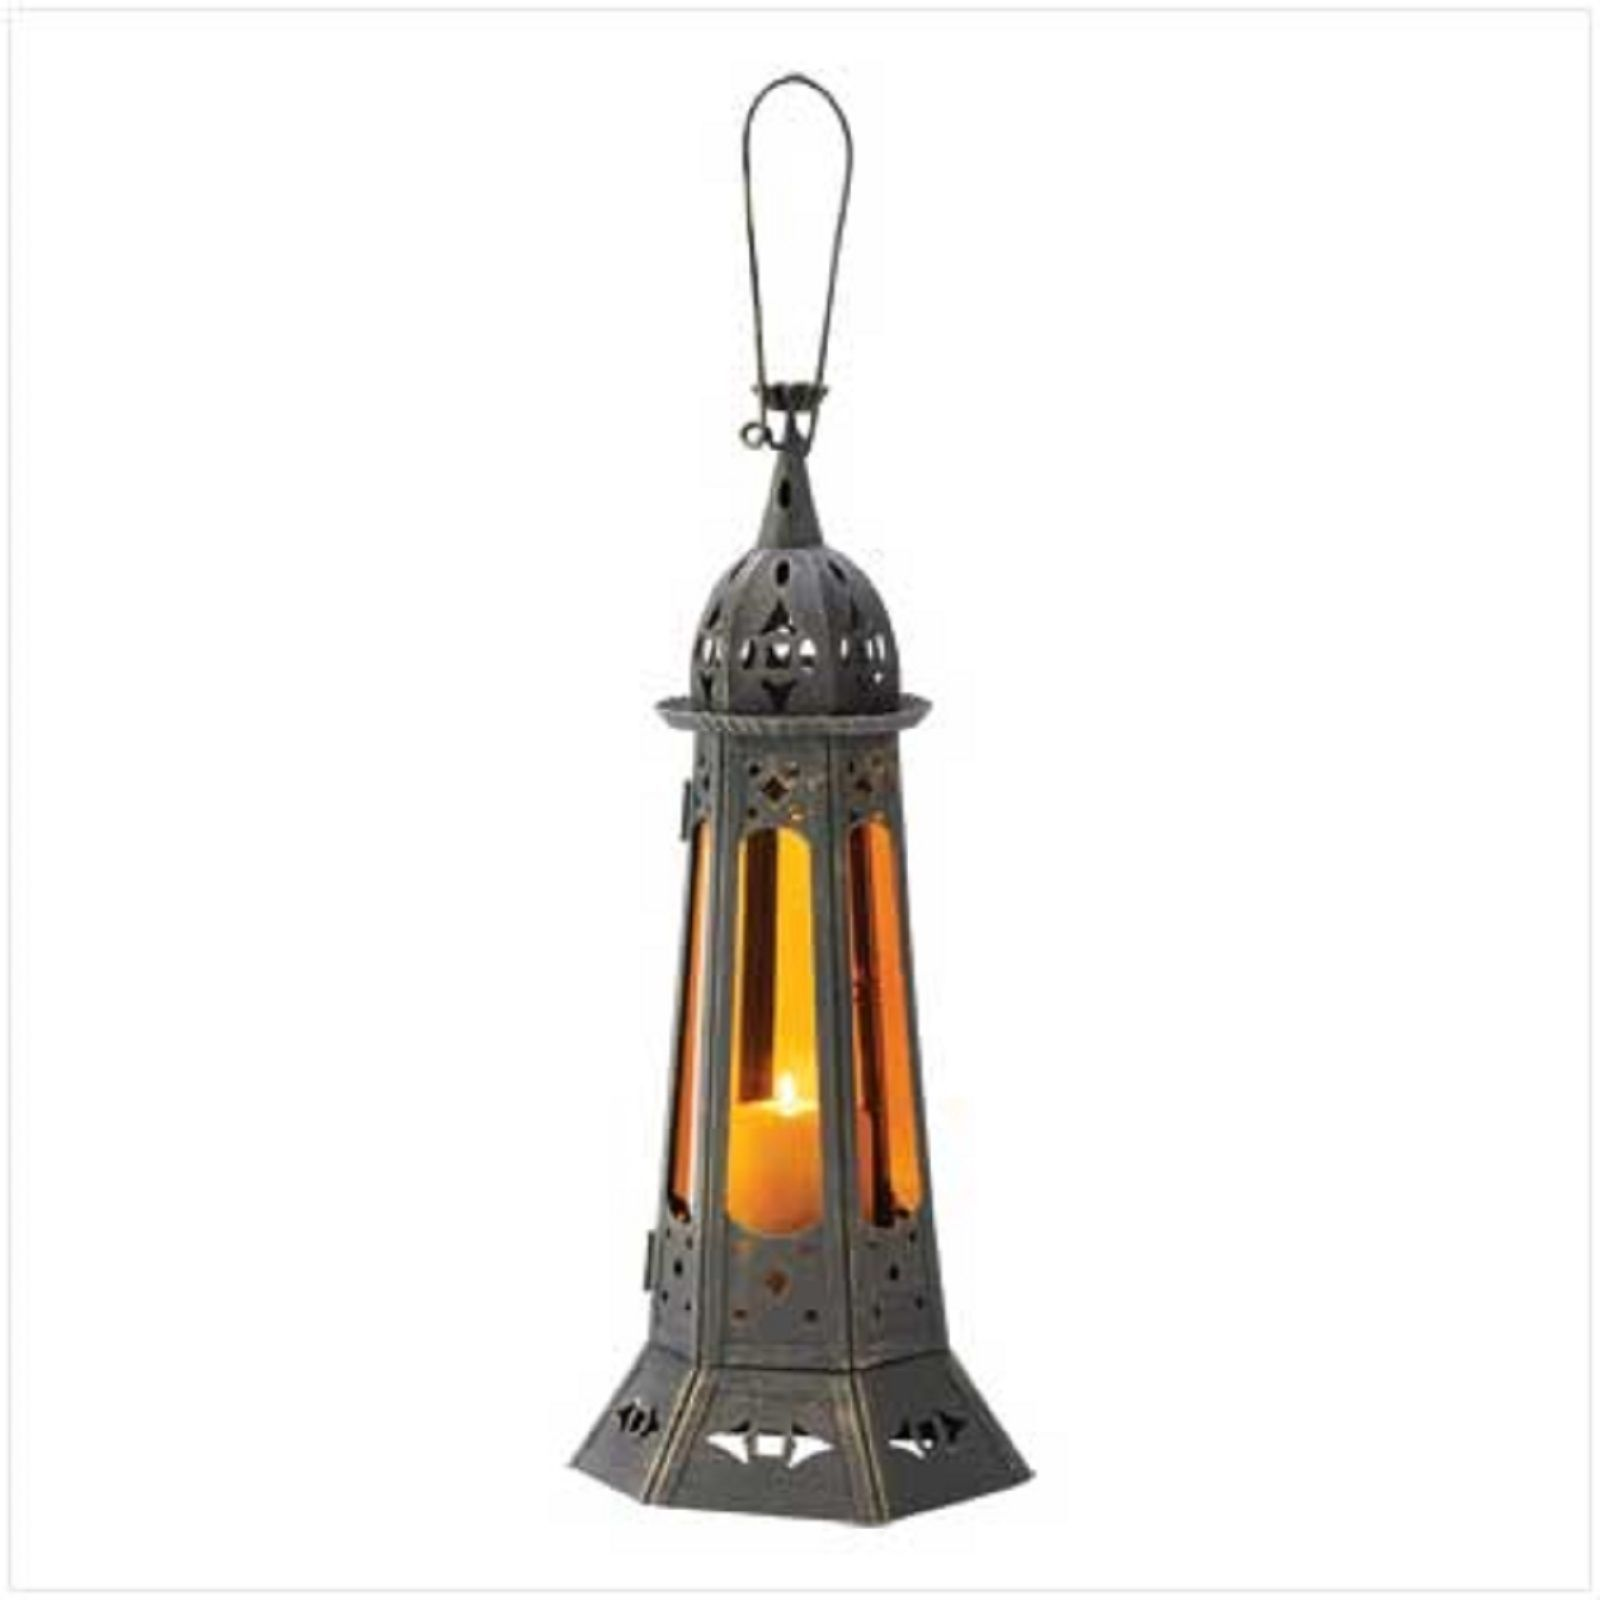 12 Tall Amber Lantern Candleholder Table Decor Wedding Centerpieces